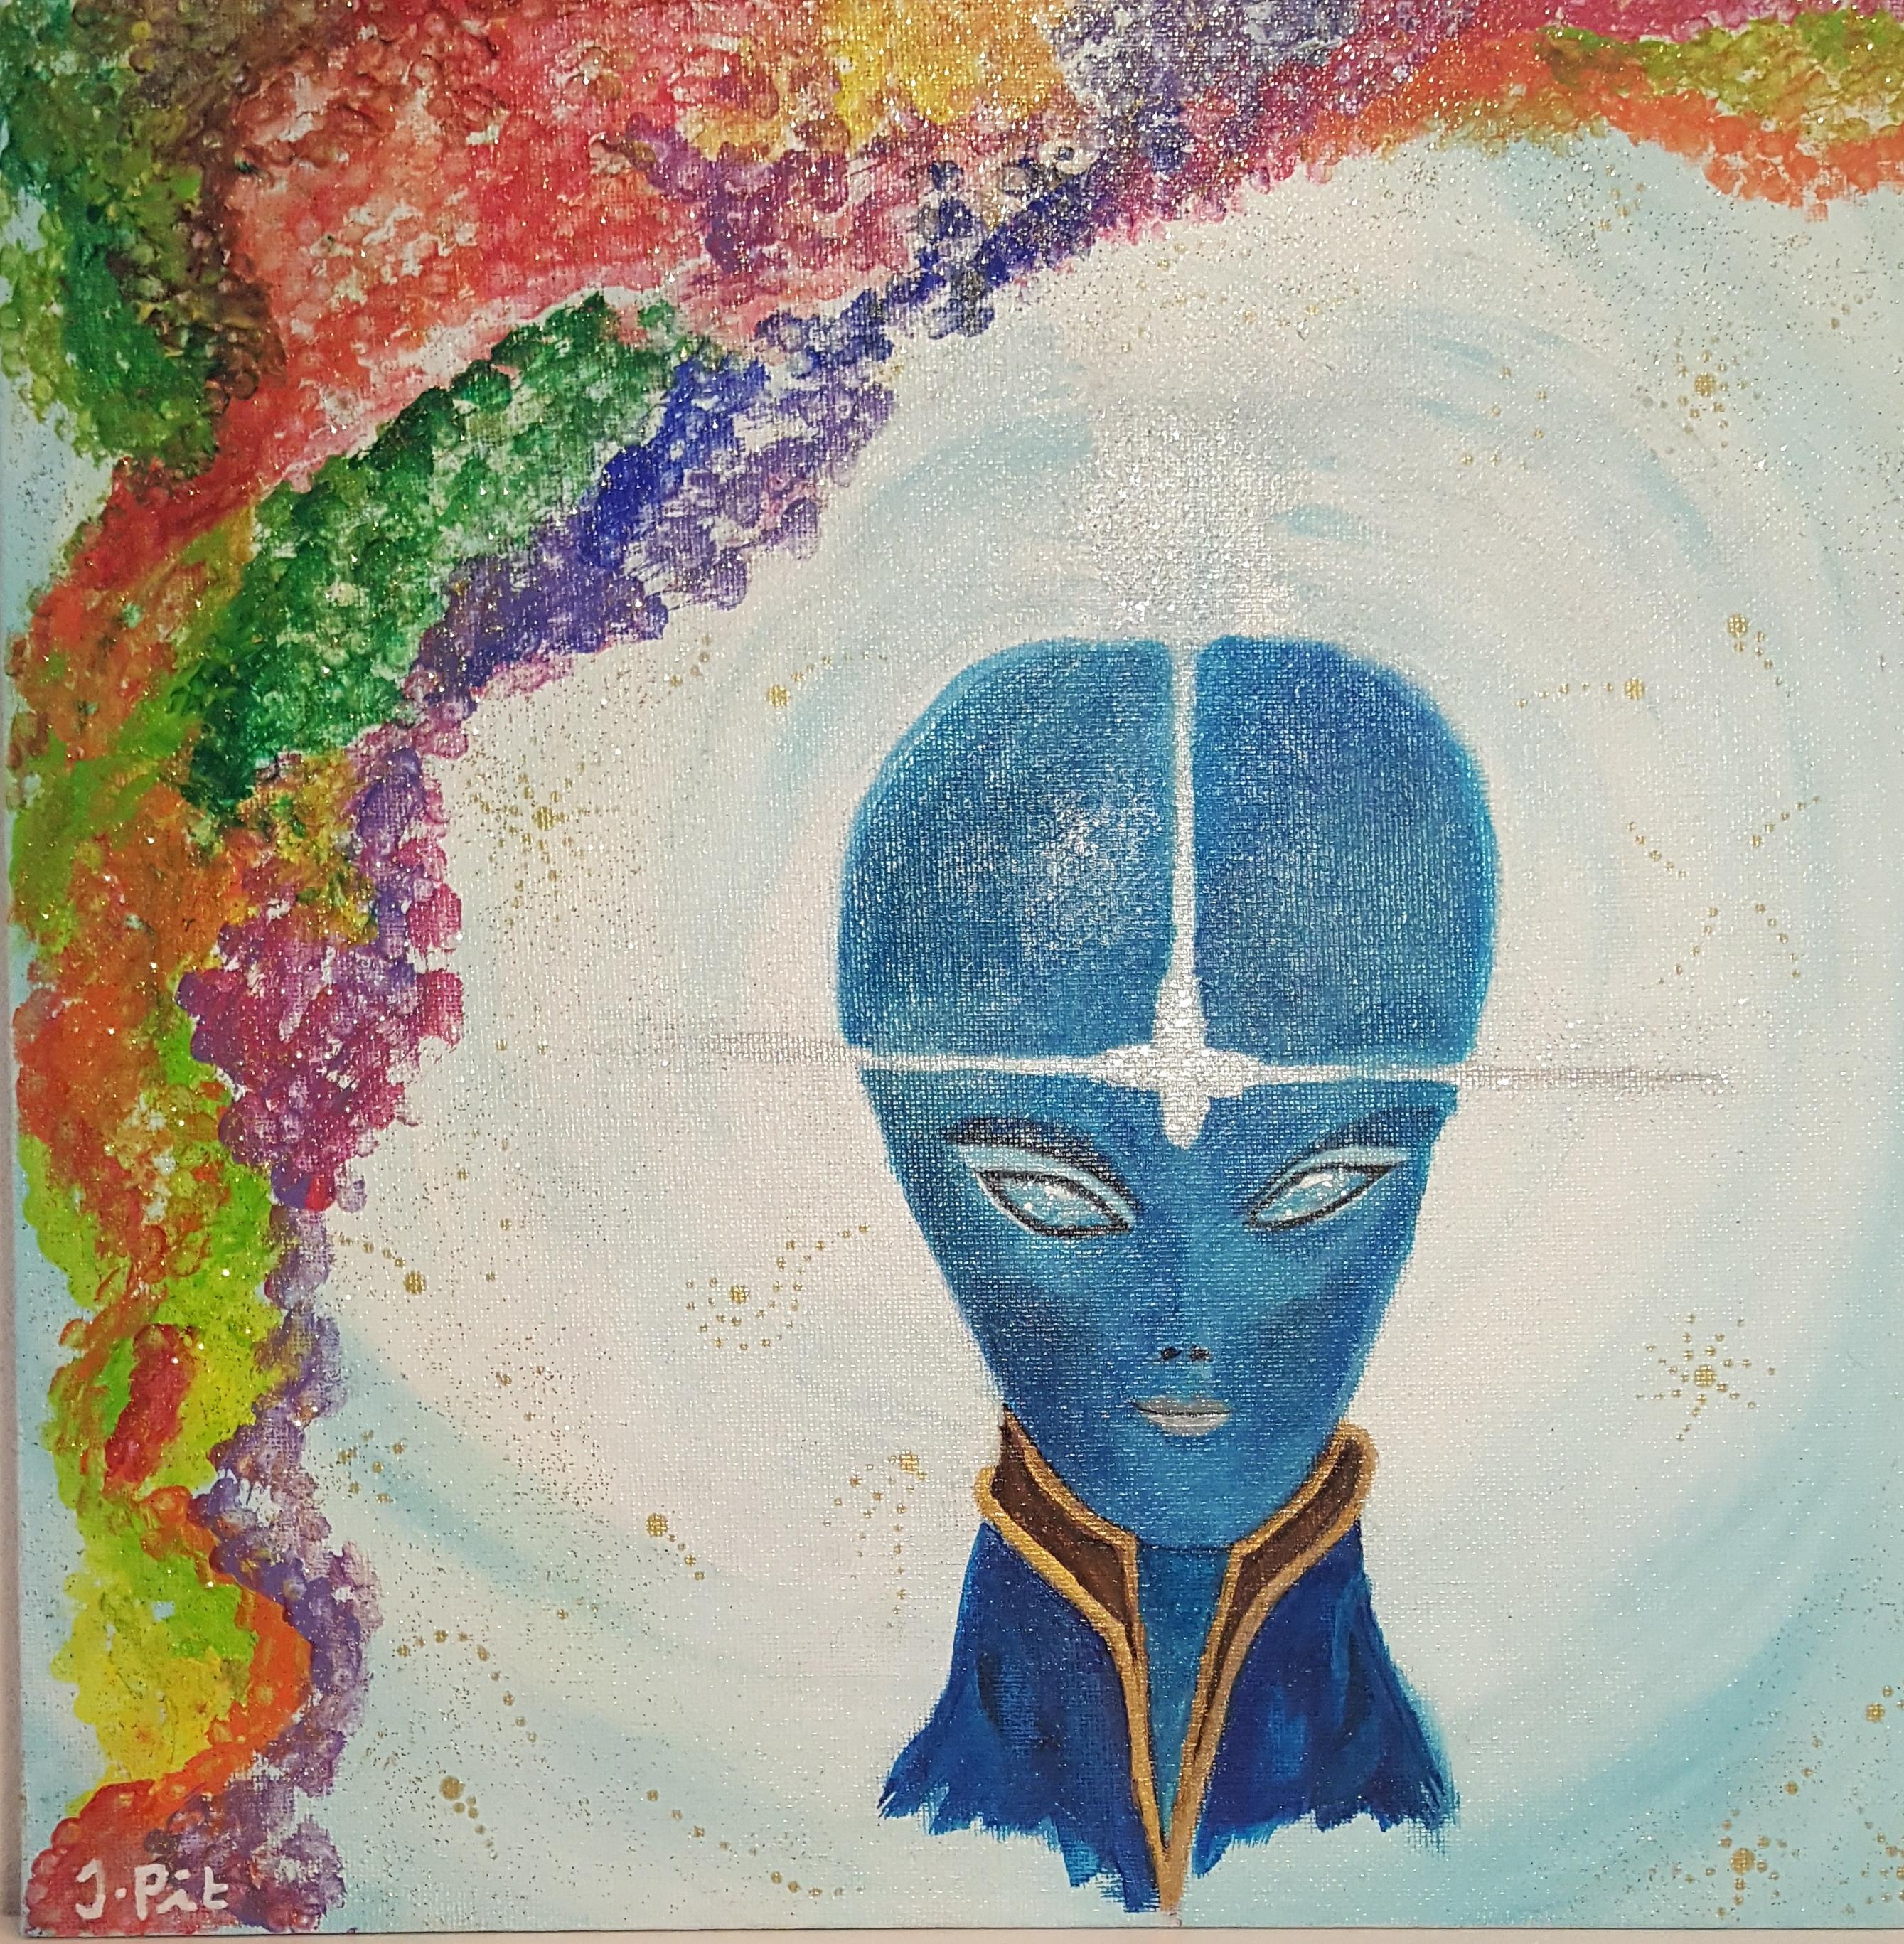 Arcturian Galactic Dance (30x30 cm canvasboard)